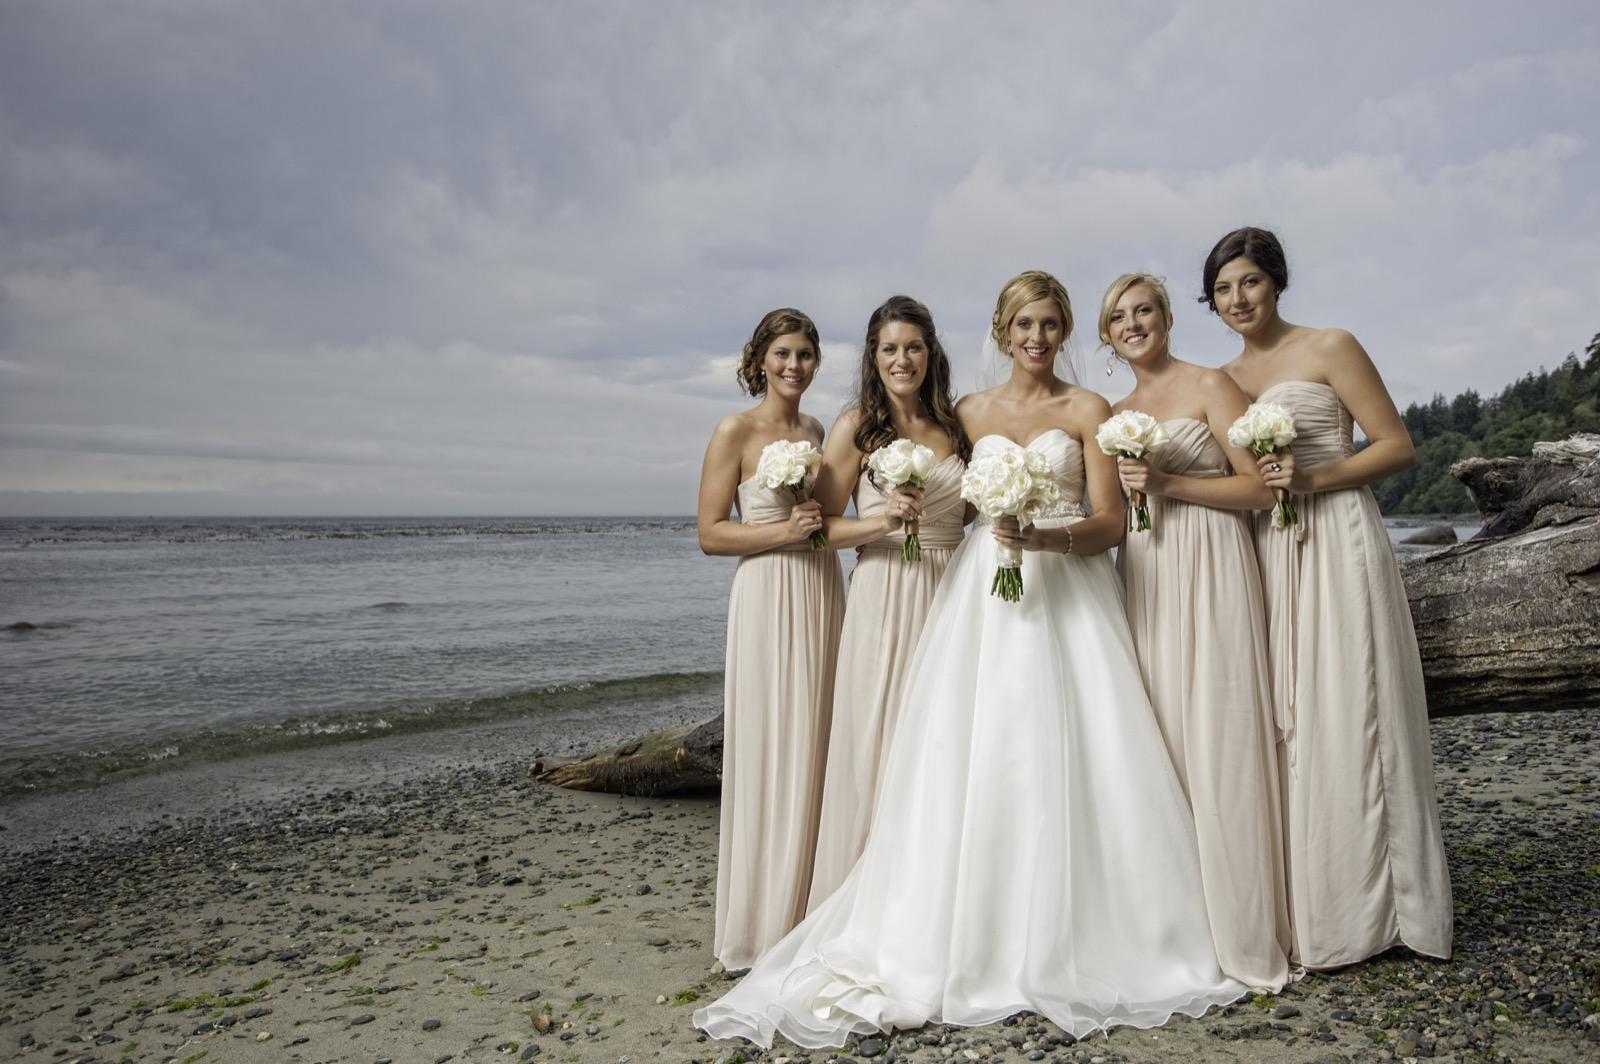 sooke-wedding-photographers-craidelonna-oceanedge-lodge-wedding-67.jpg